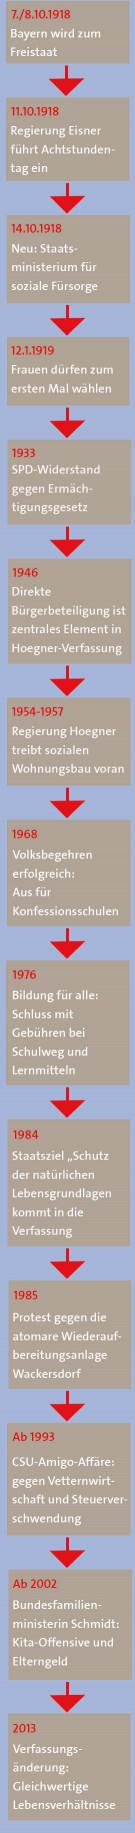 100 Jahre Freistaat: Zeitstrahl